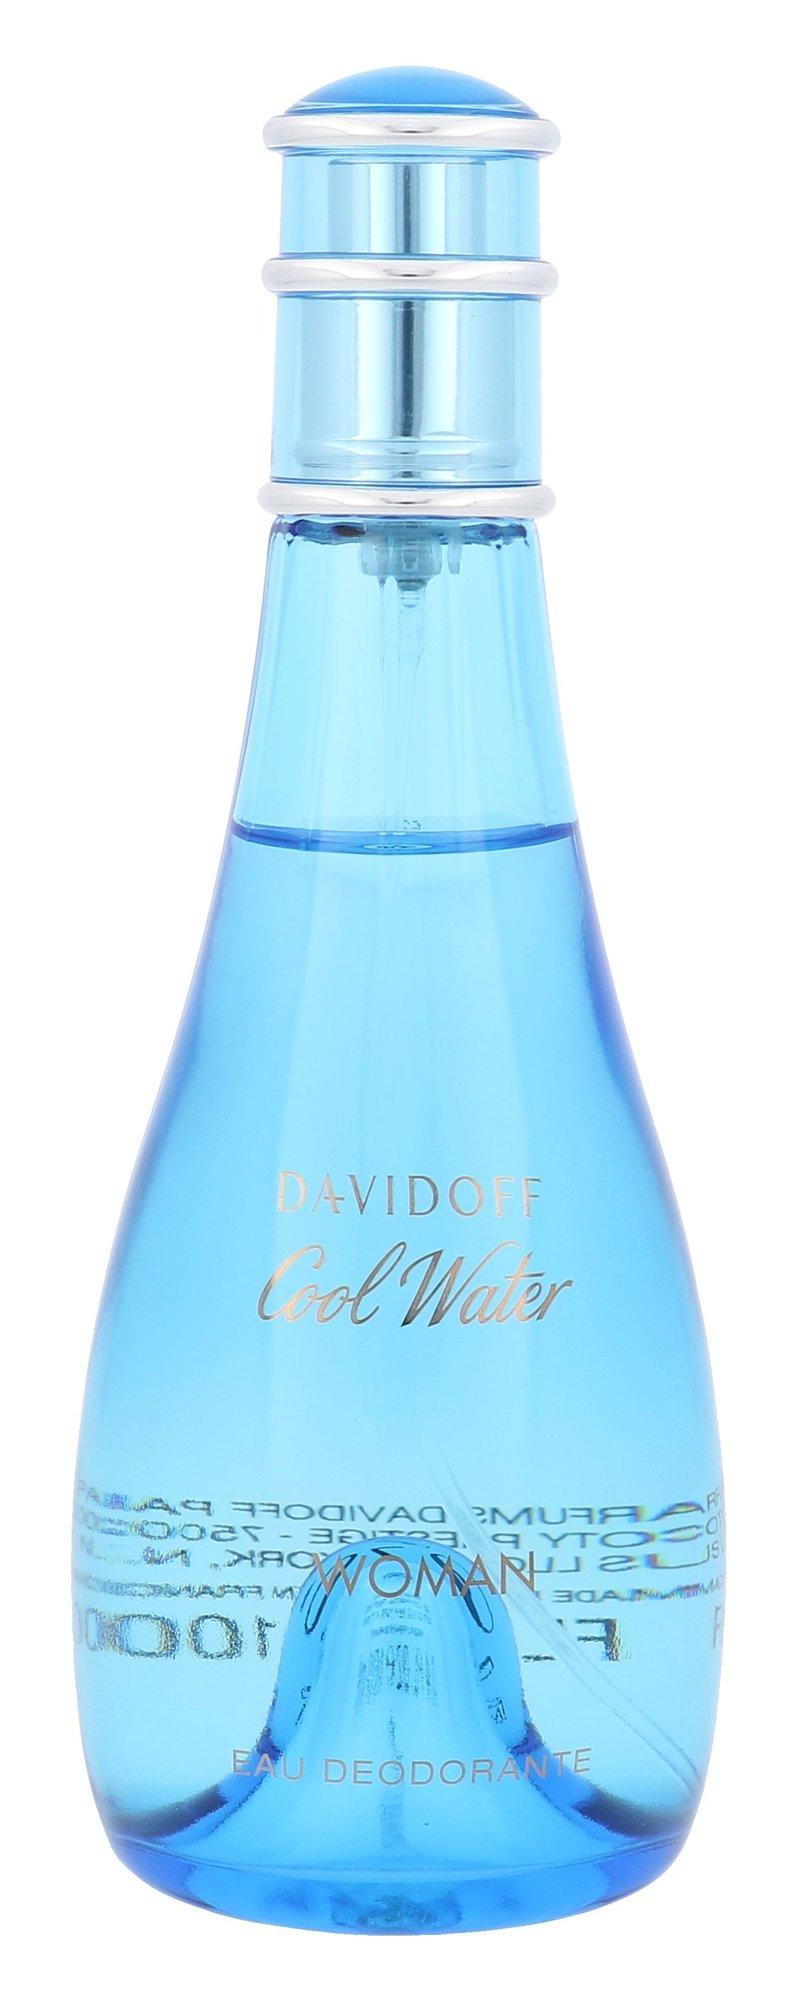 Davidoff Cool Water Deodorant 100ml